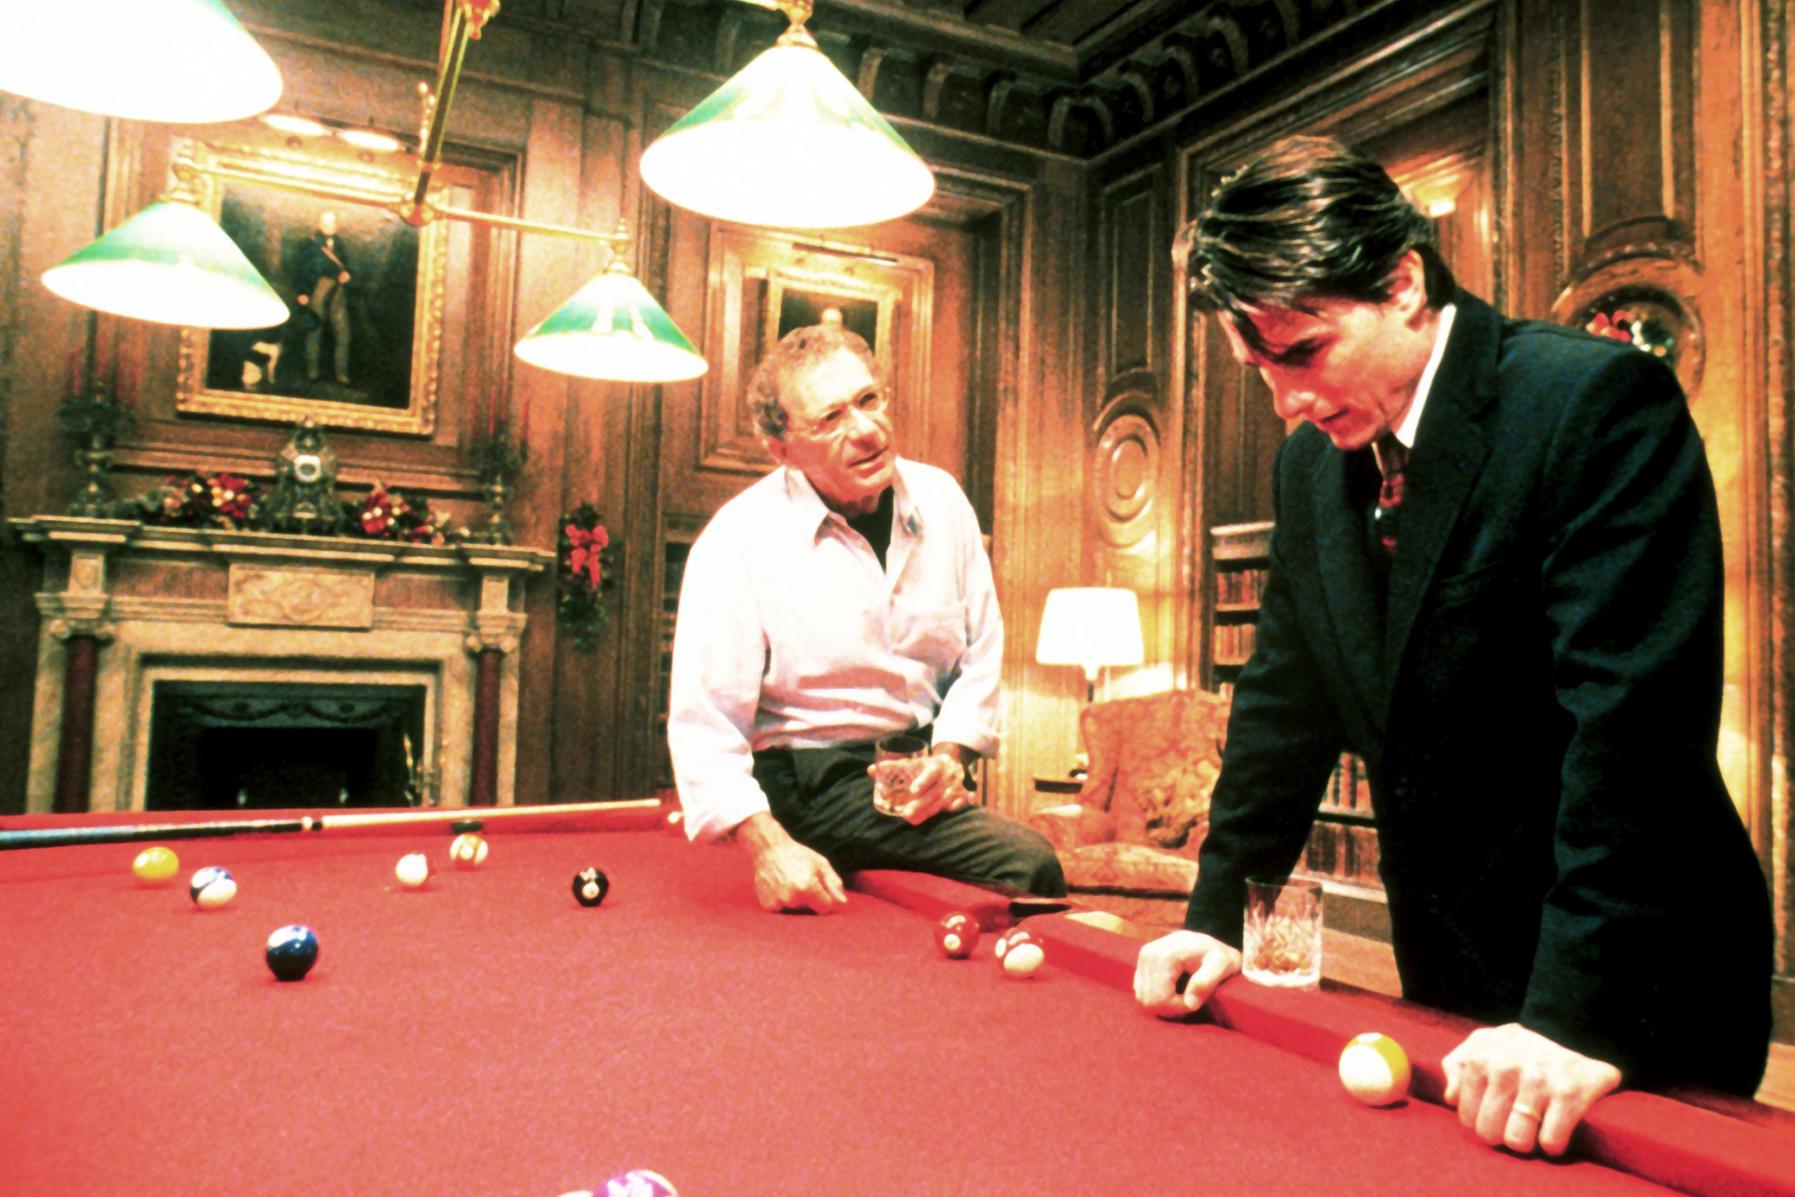 Sidney Pollack et Tom Cruise dans Eyes Wide Shut © Warner Bros. Entertainment, Inc.